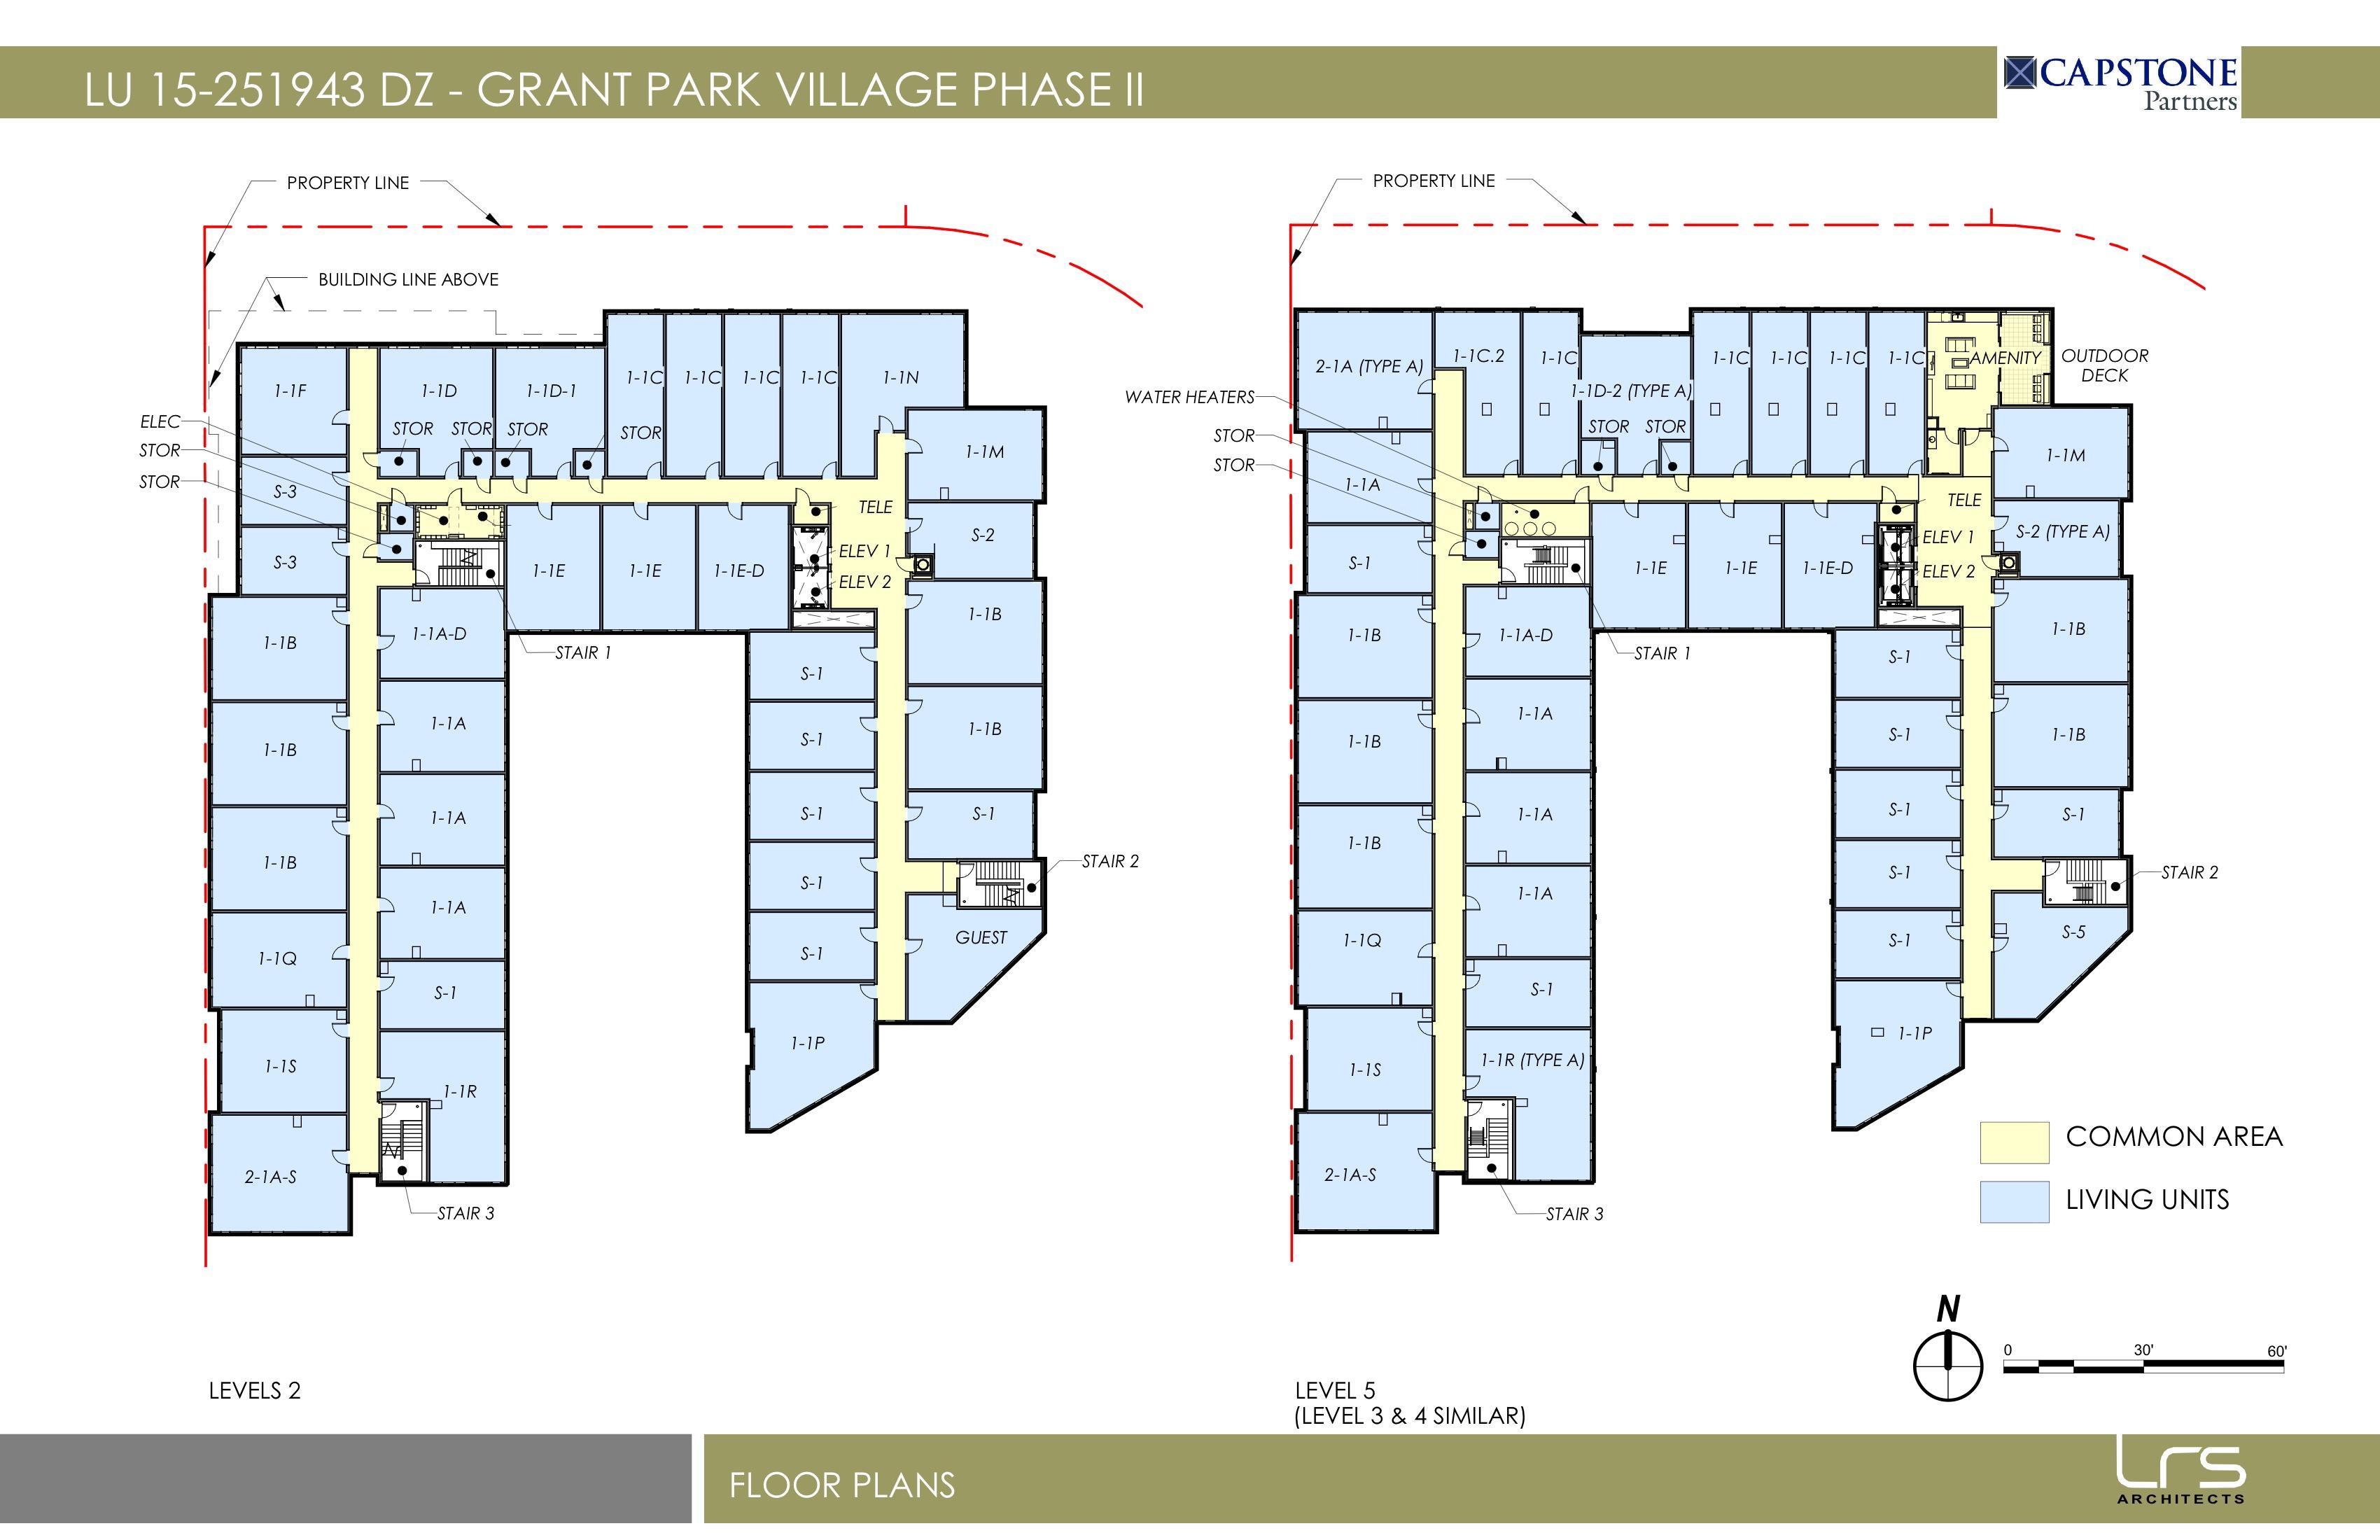 Grant Park Village Phase II